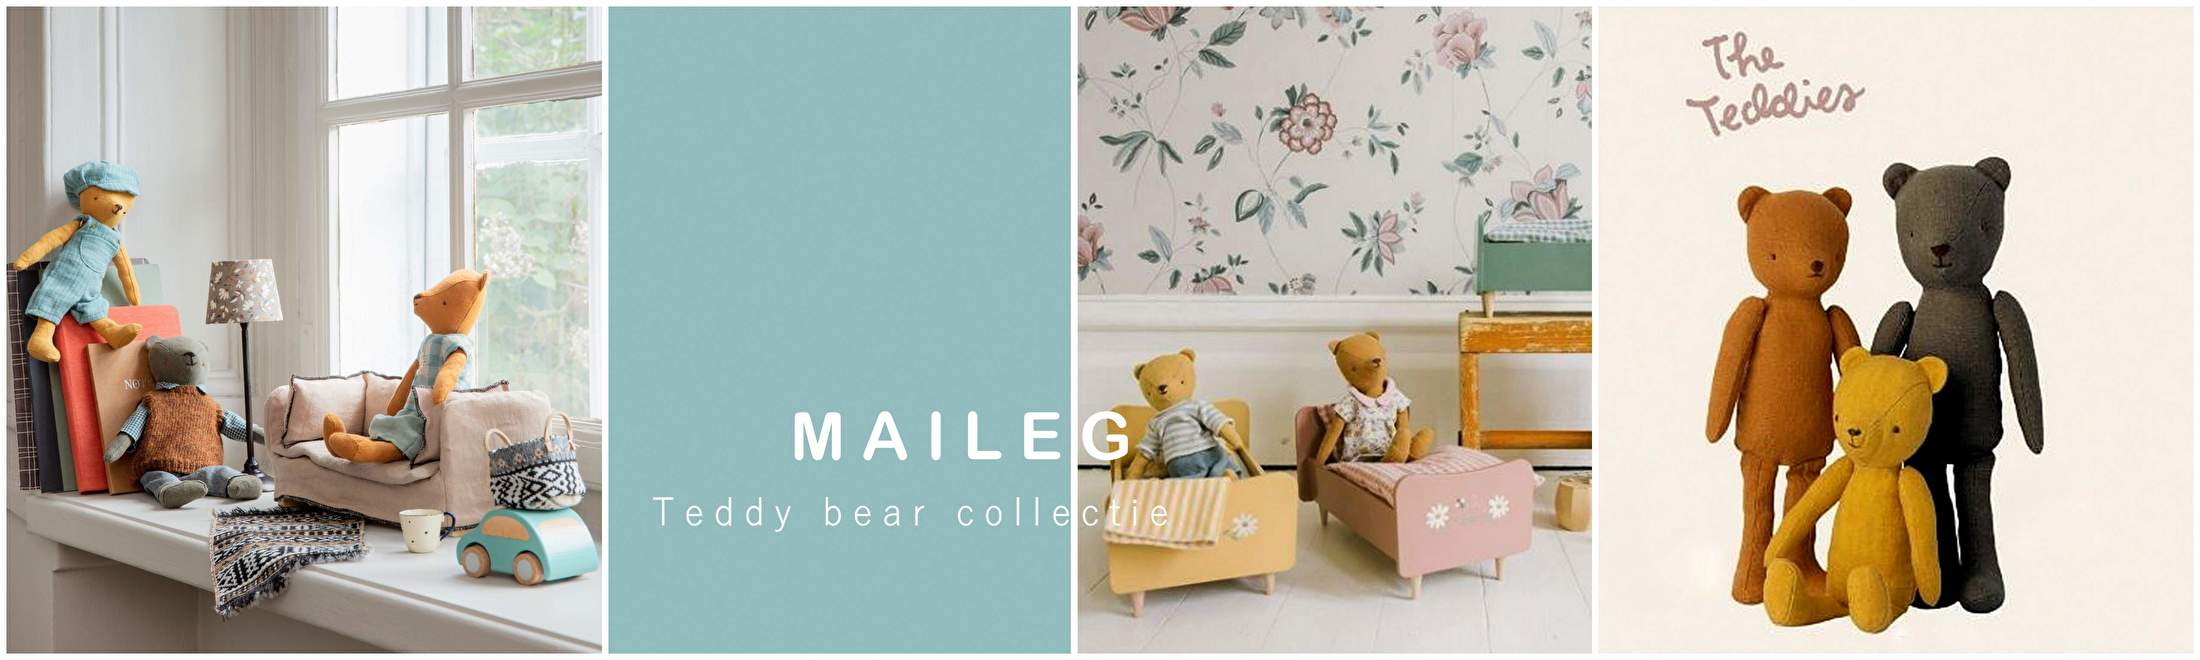 MAILEG TEDDY BEAR COLLECTIE